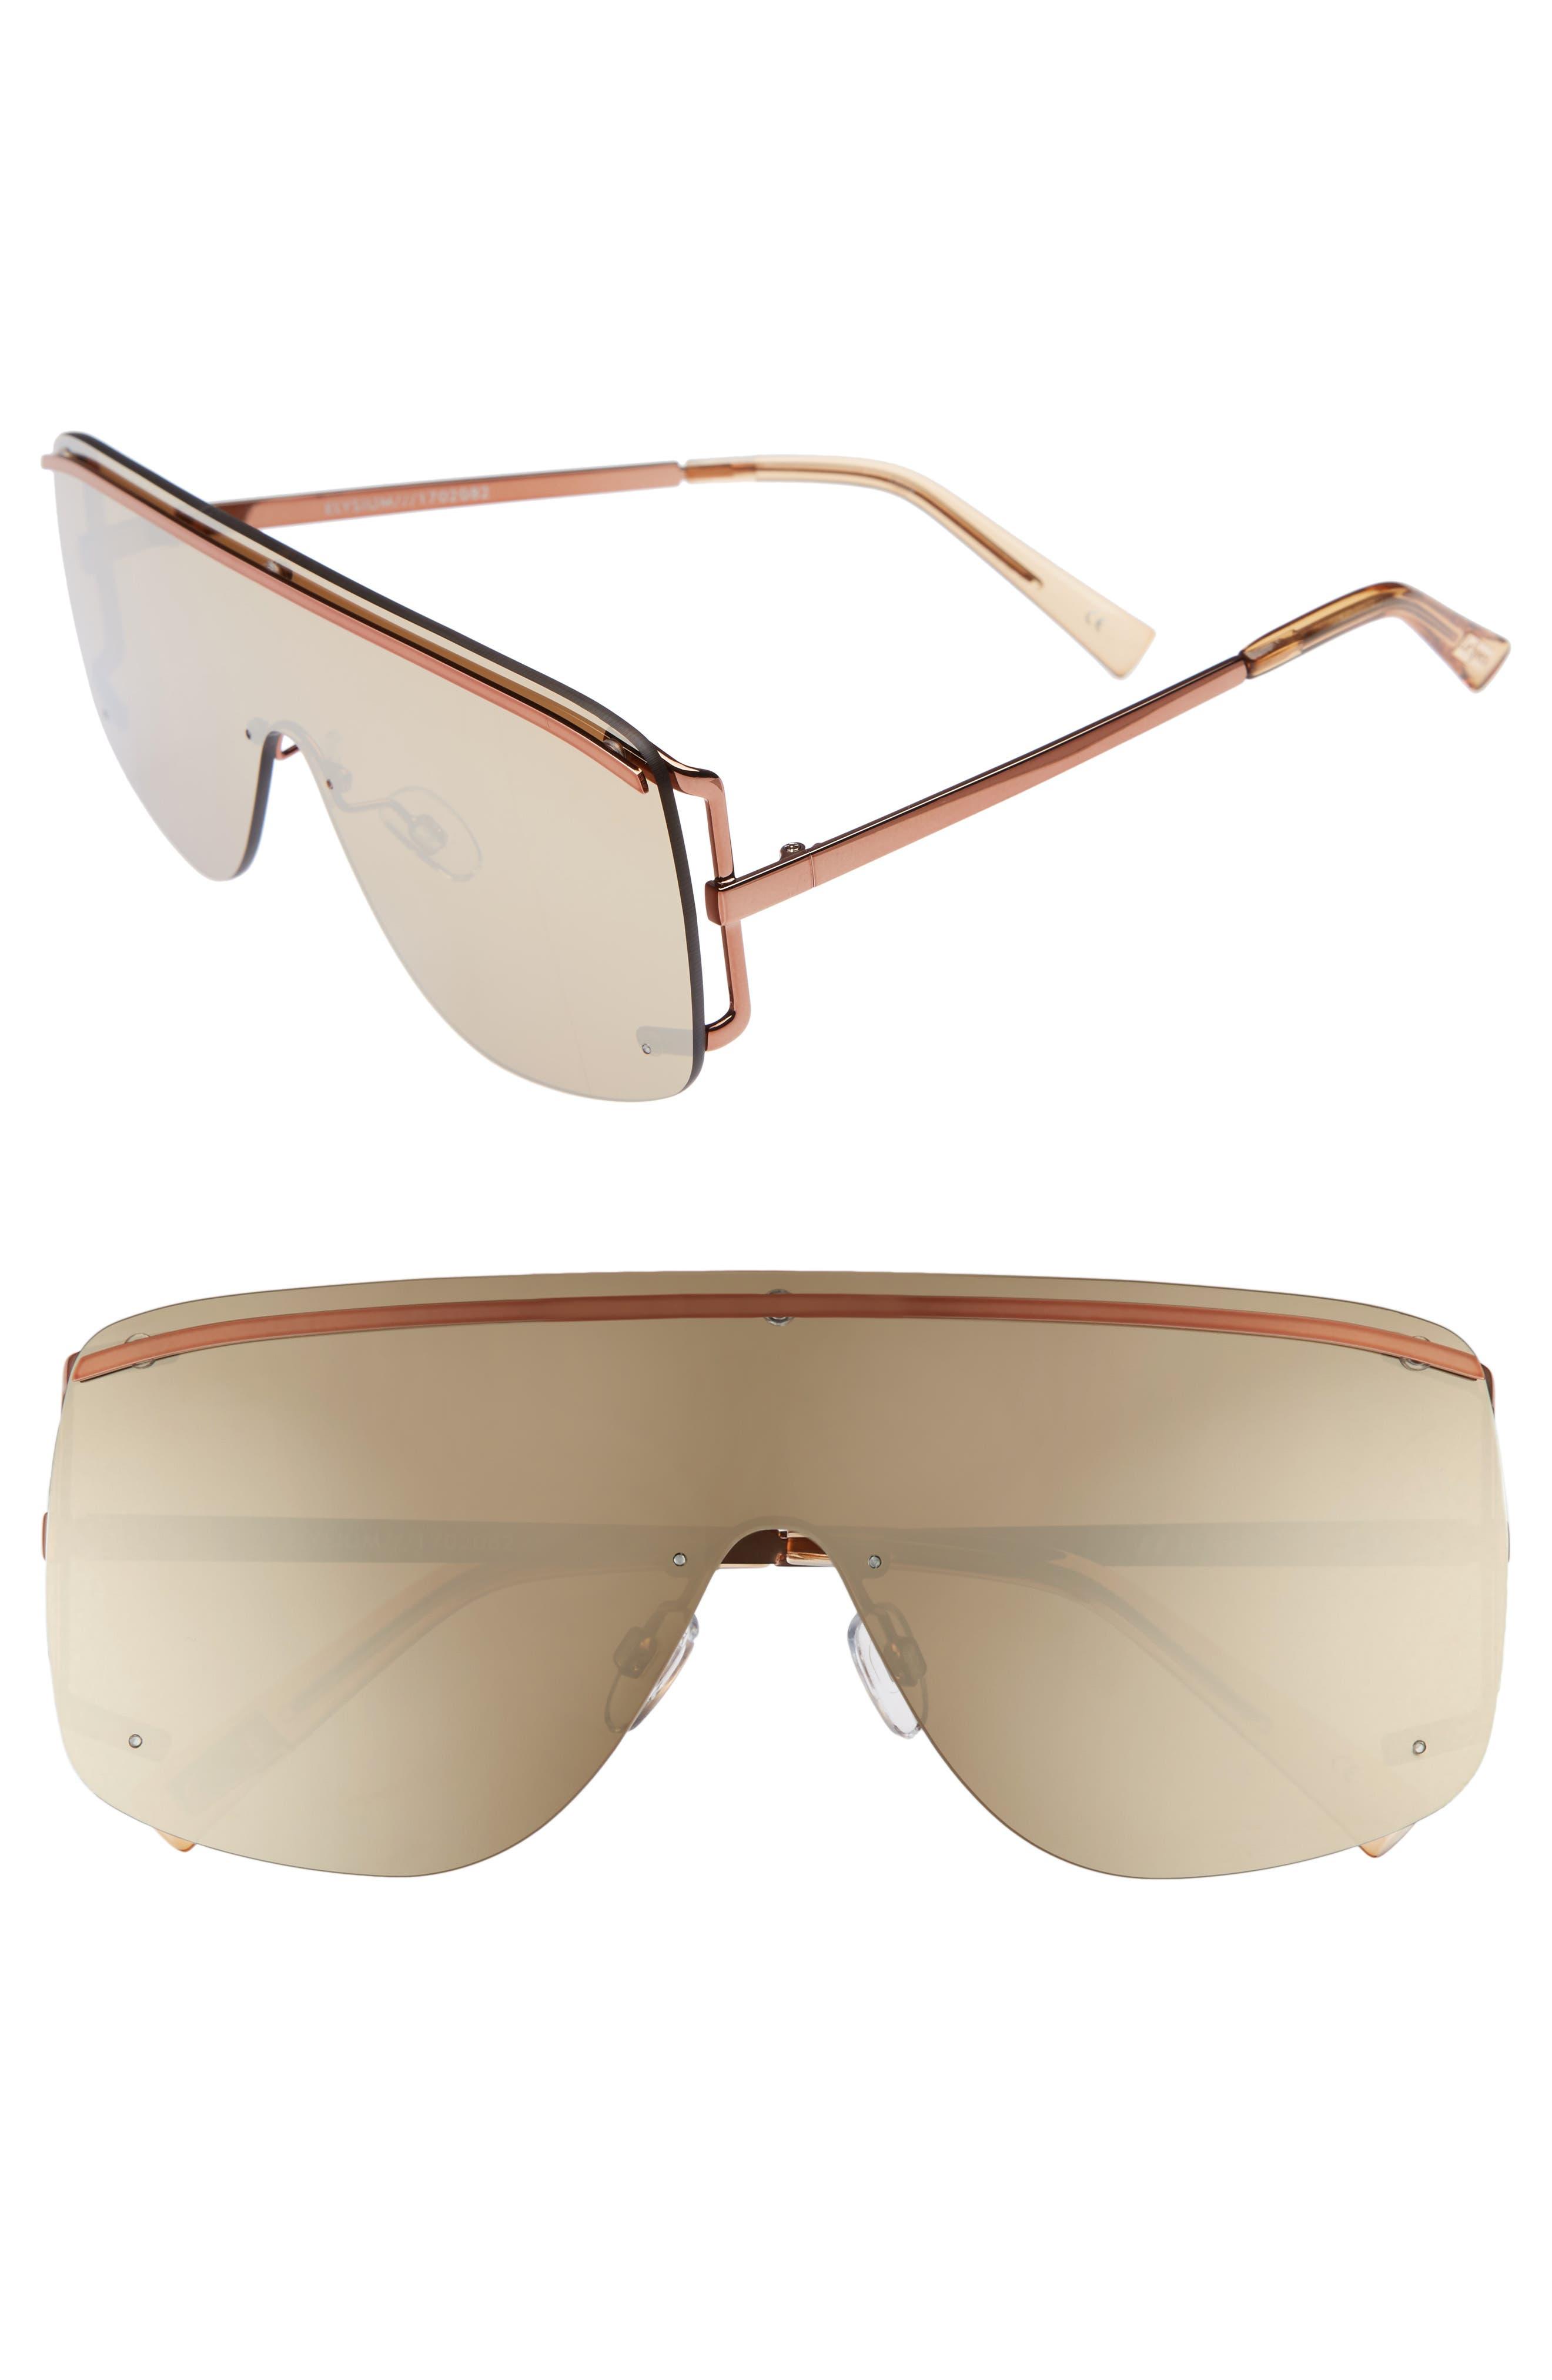 Elysium 140mm Shield Sunglasses,                         Main,                         color, COPPER